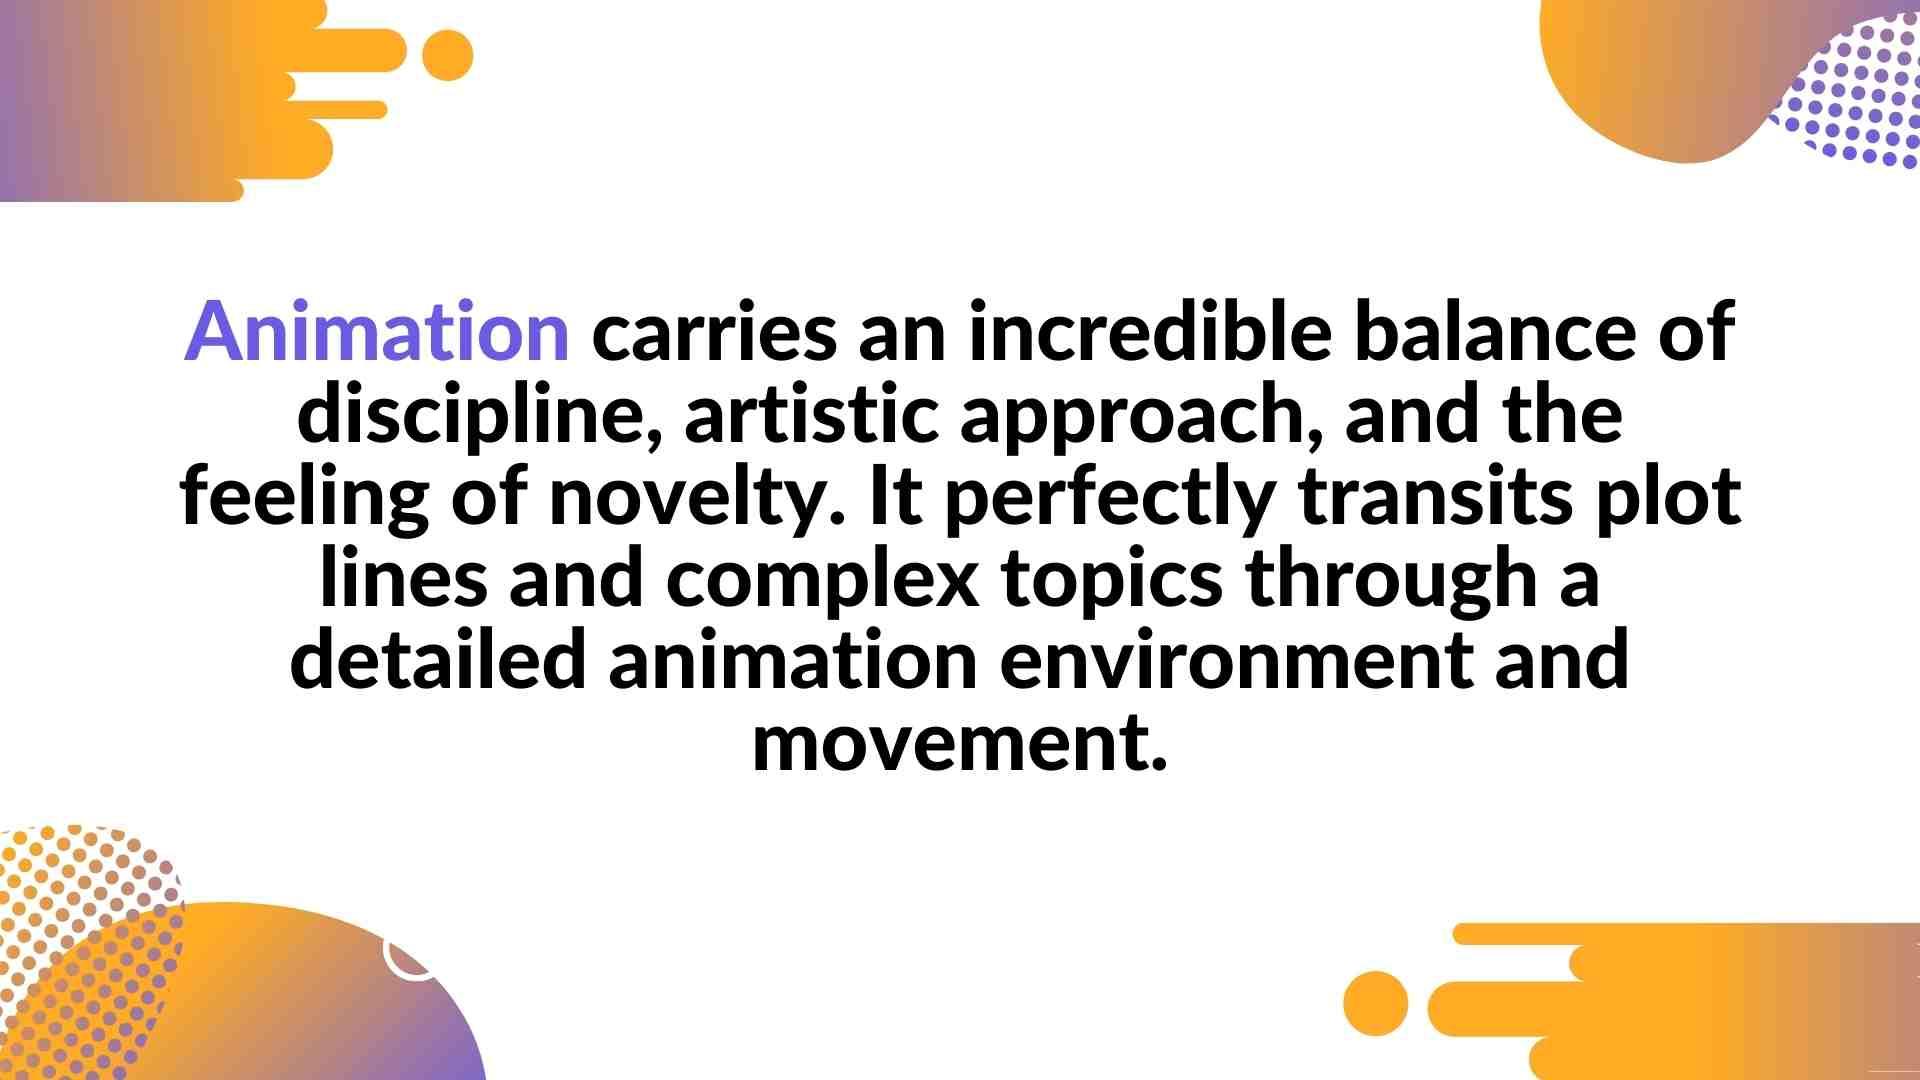 Incredible animation capabilities